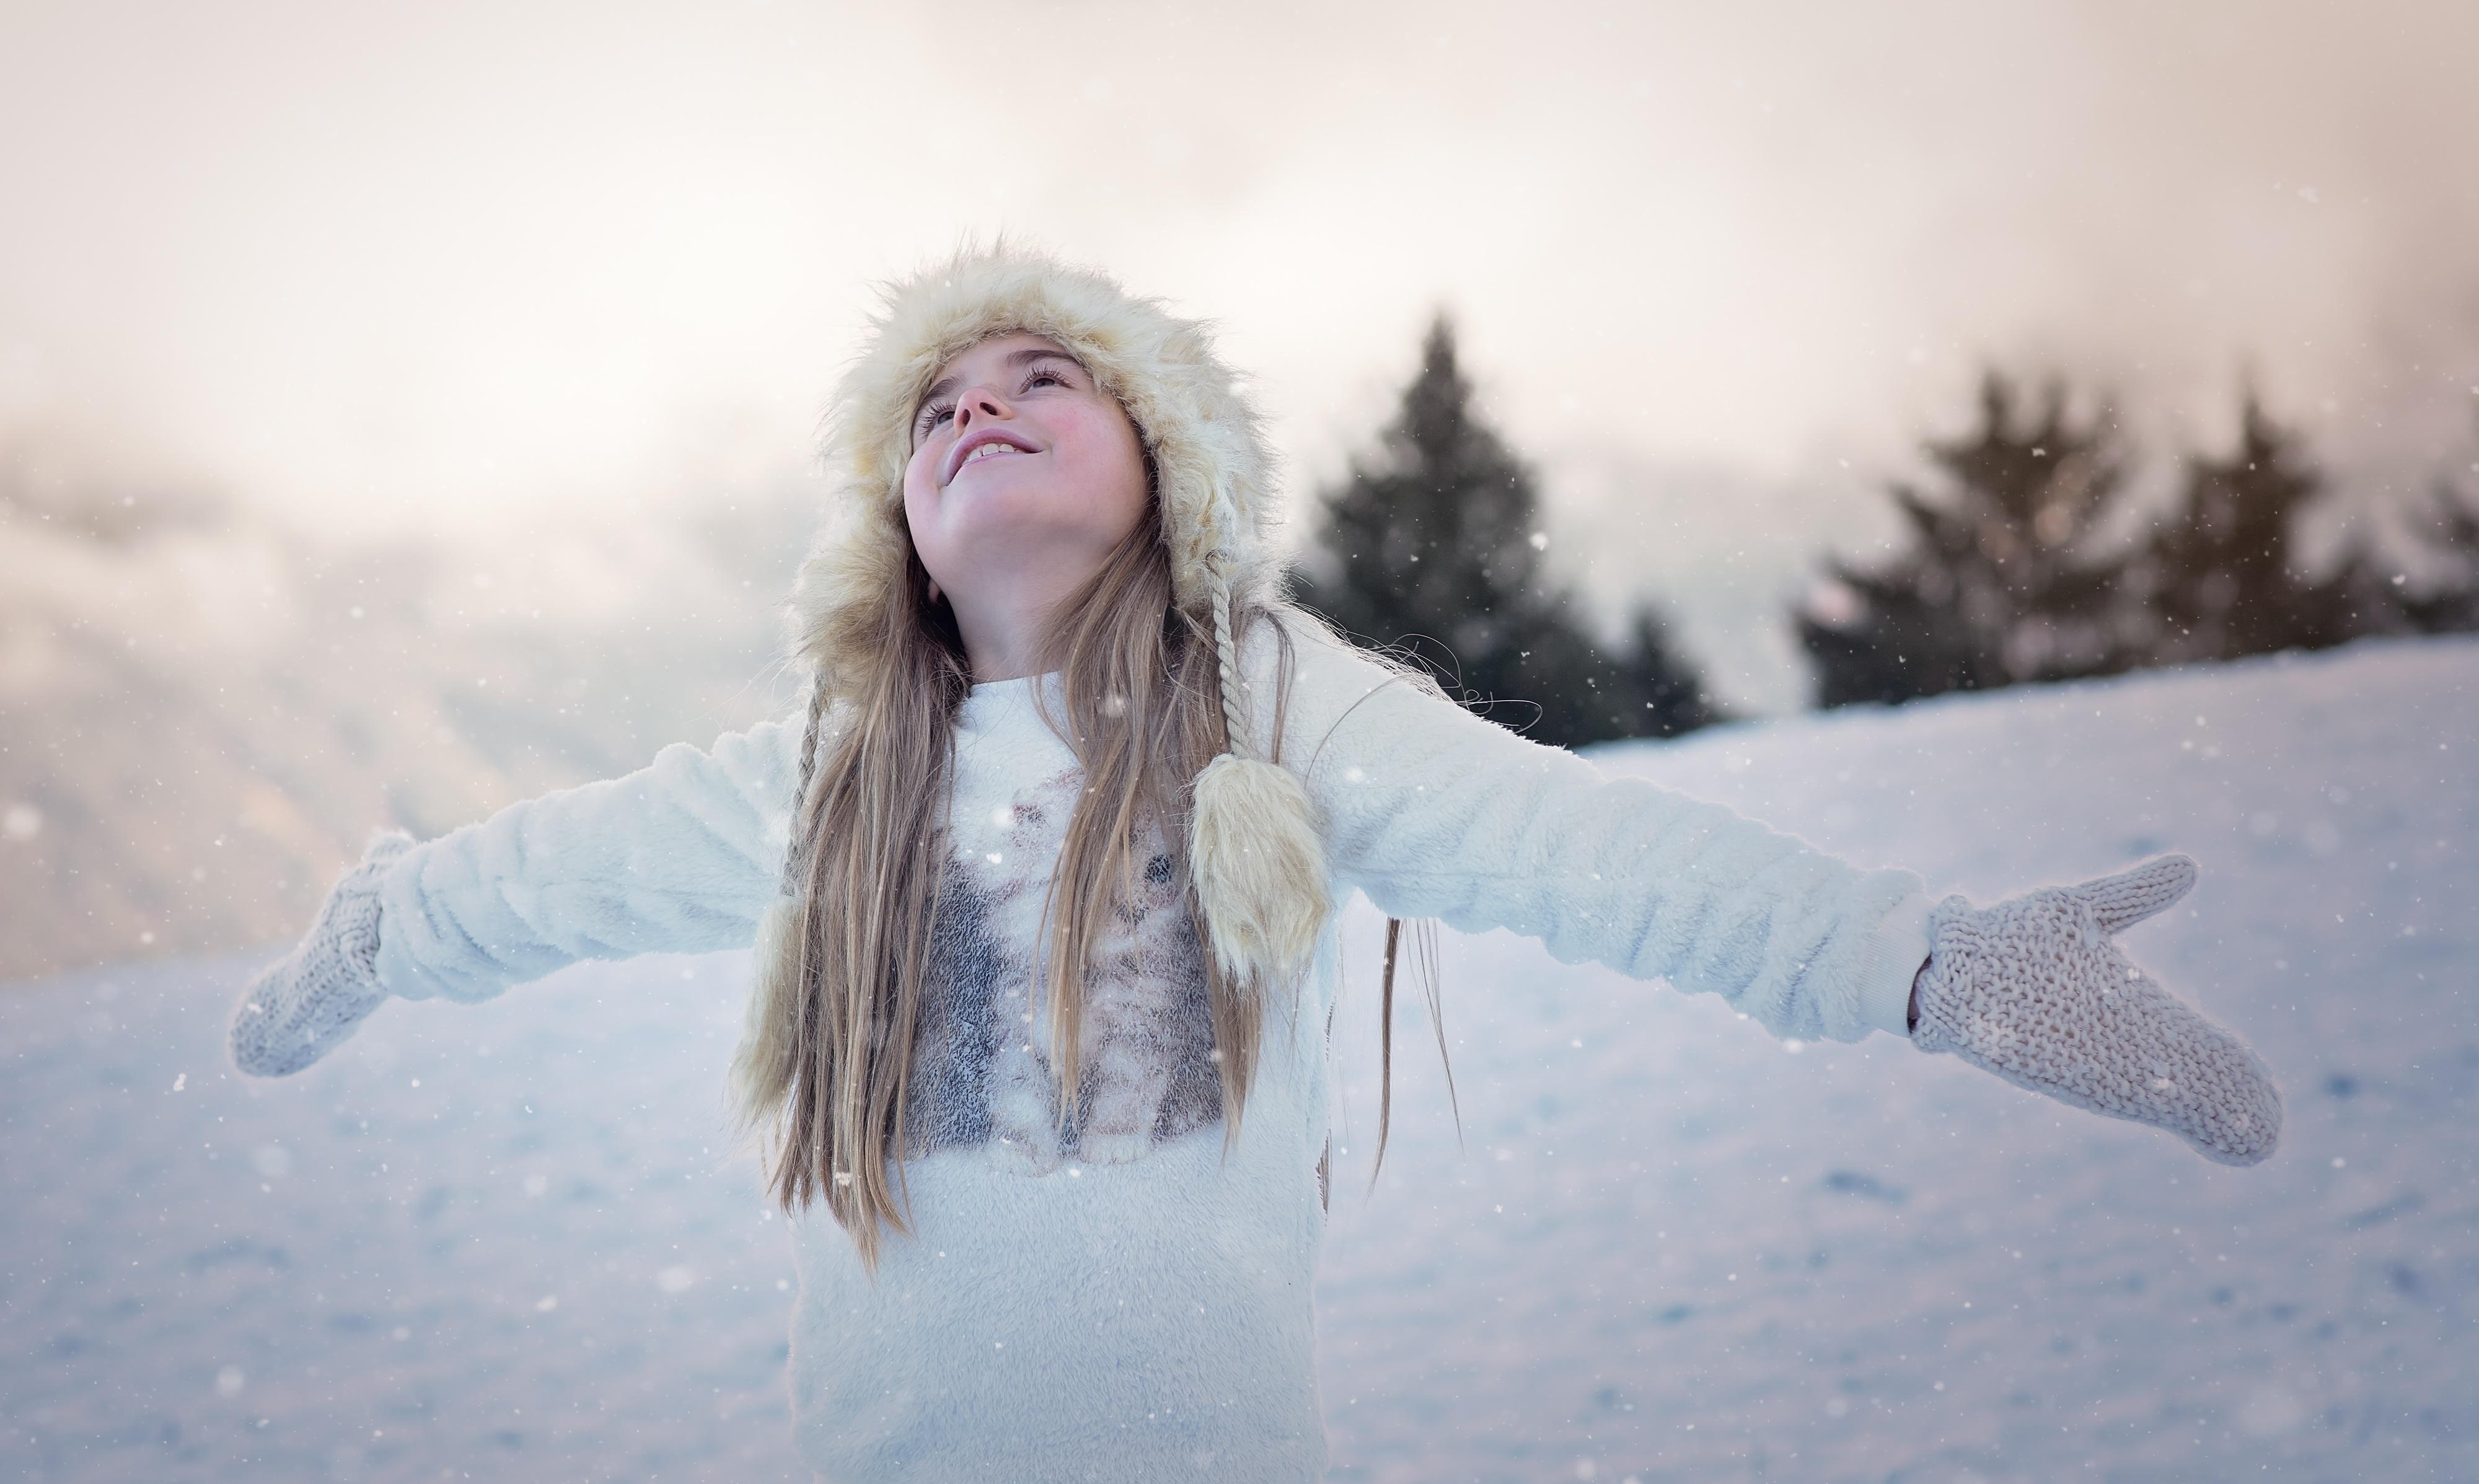 Gambar Orang Musim Dingin Gadis Wanita Potret Musim Semi